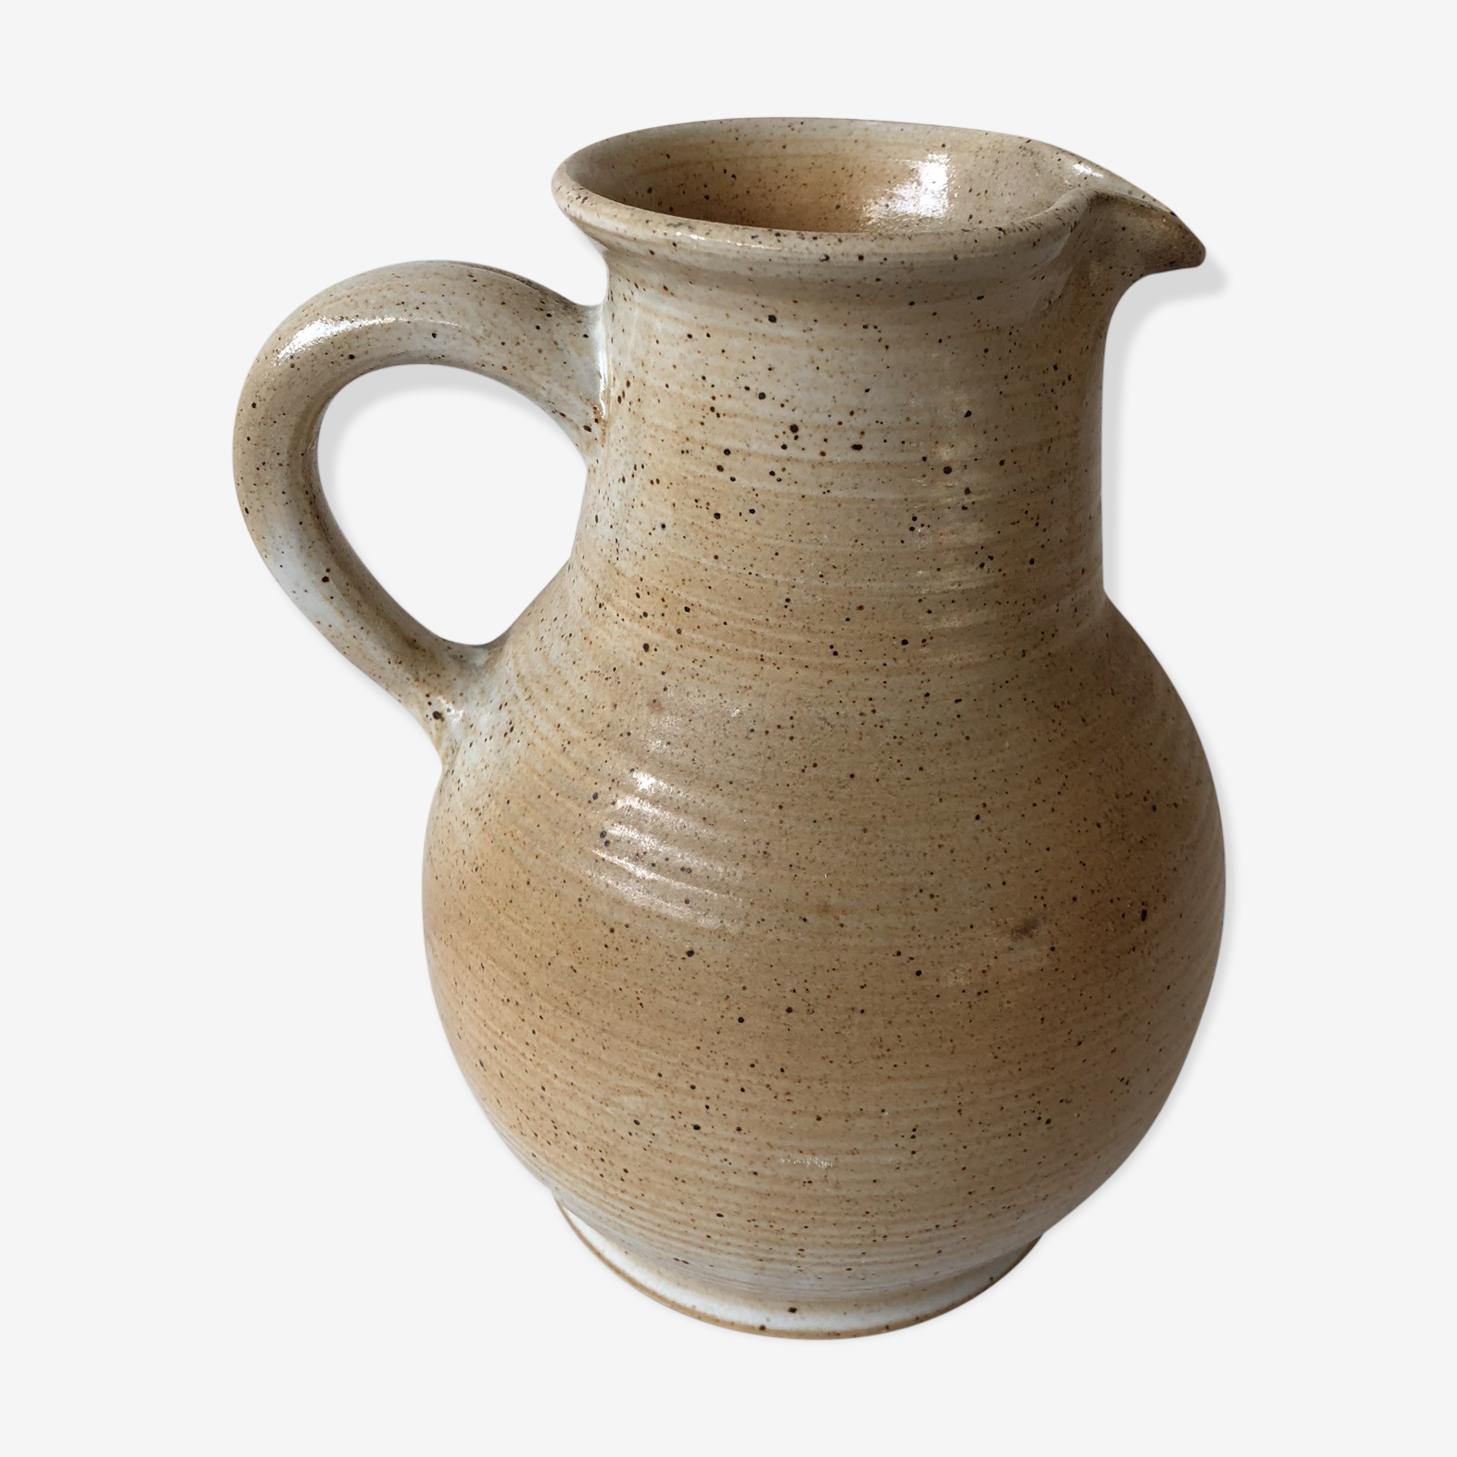 Polish stoneware pitcher